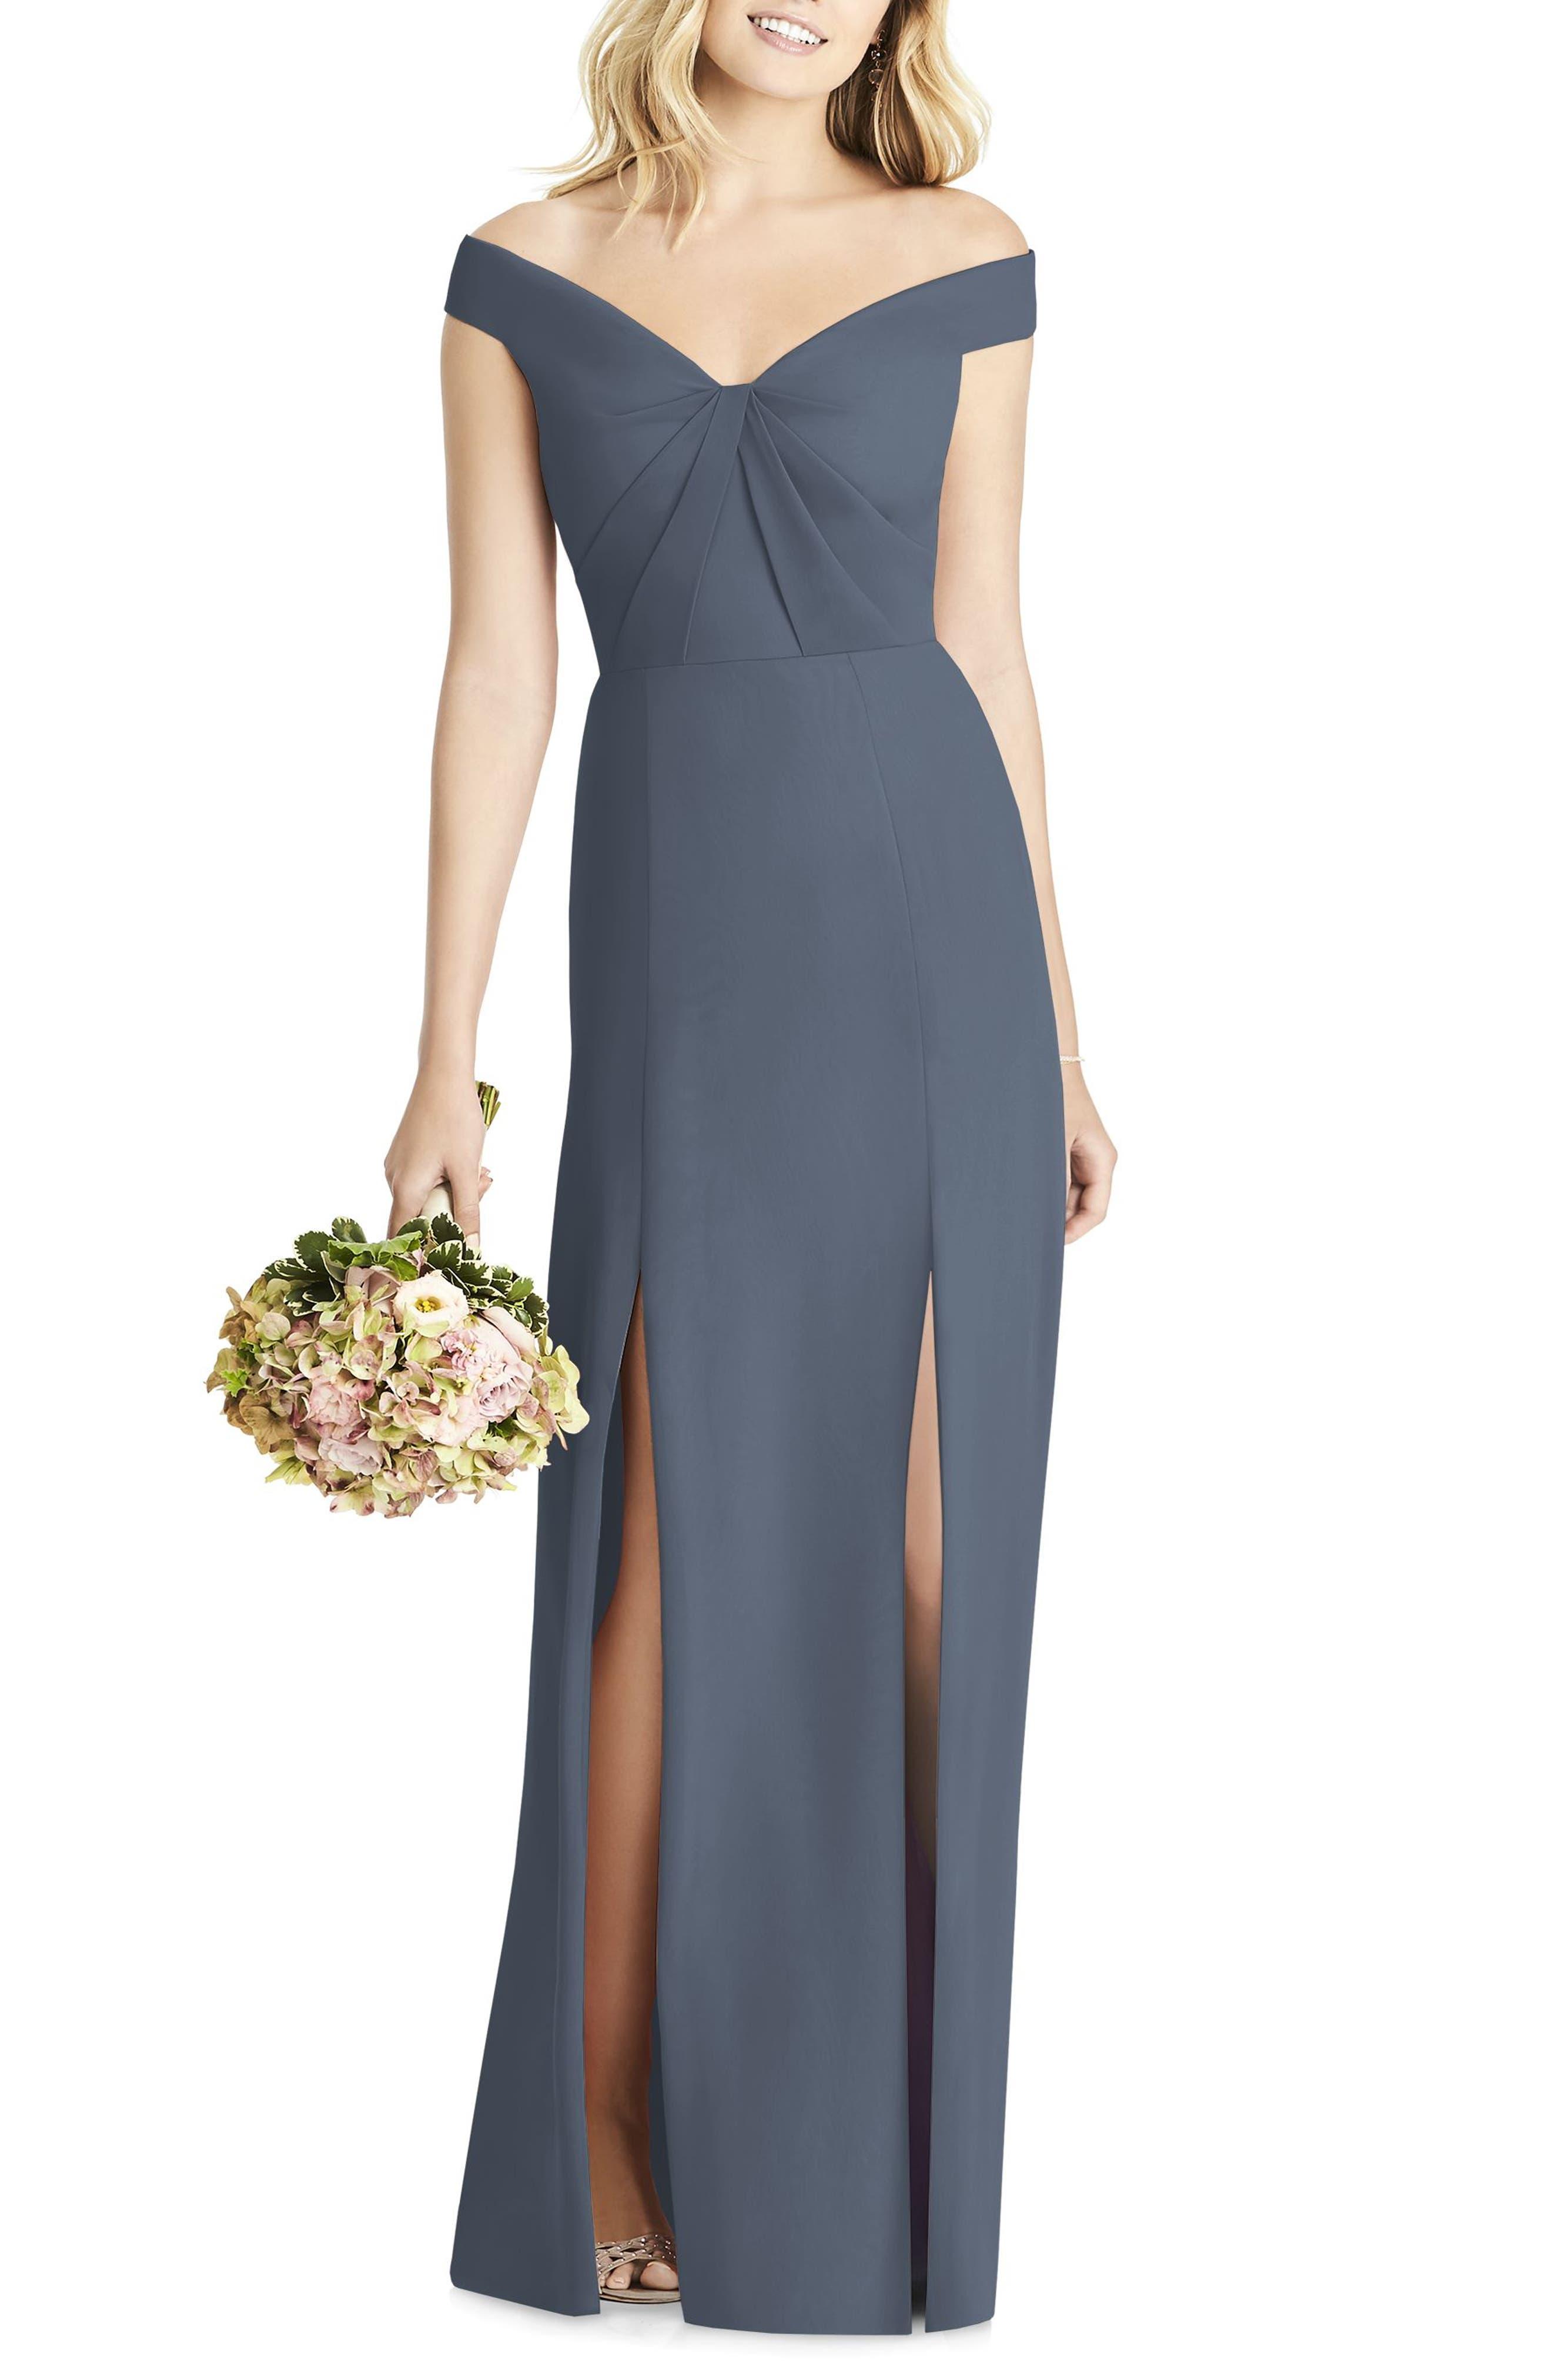 Social Bridesmaids Off The Shoulder Chiffon Gown, Grey